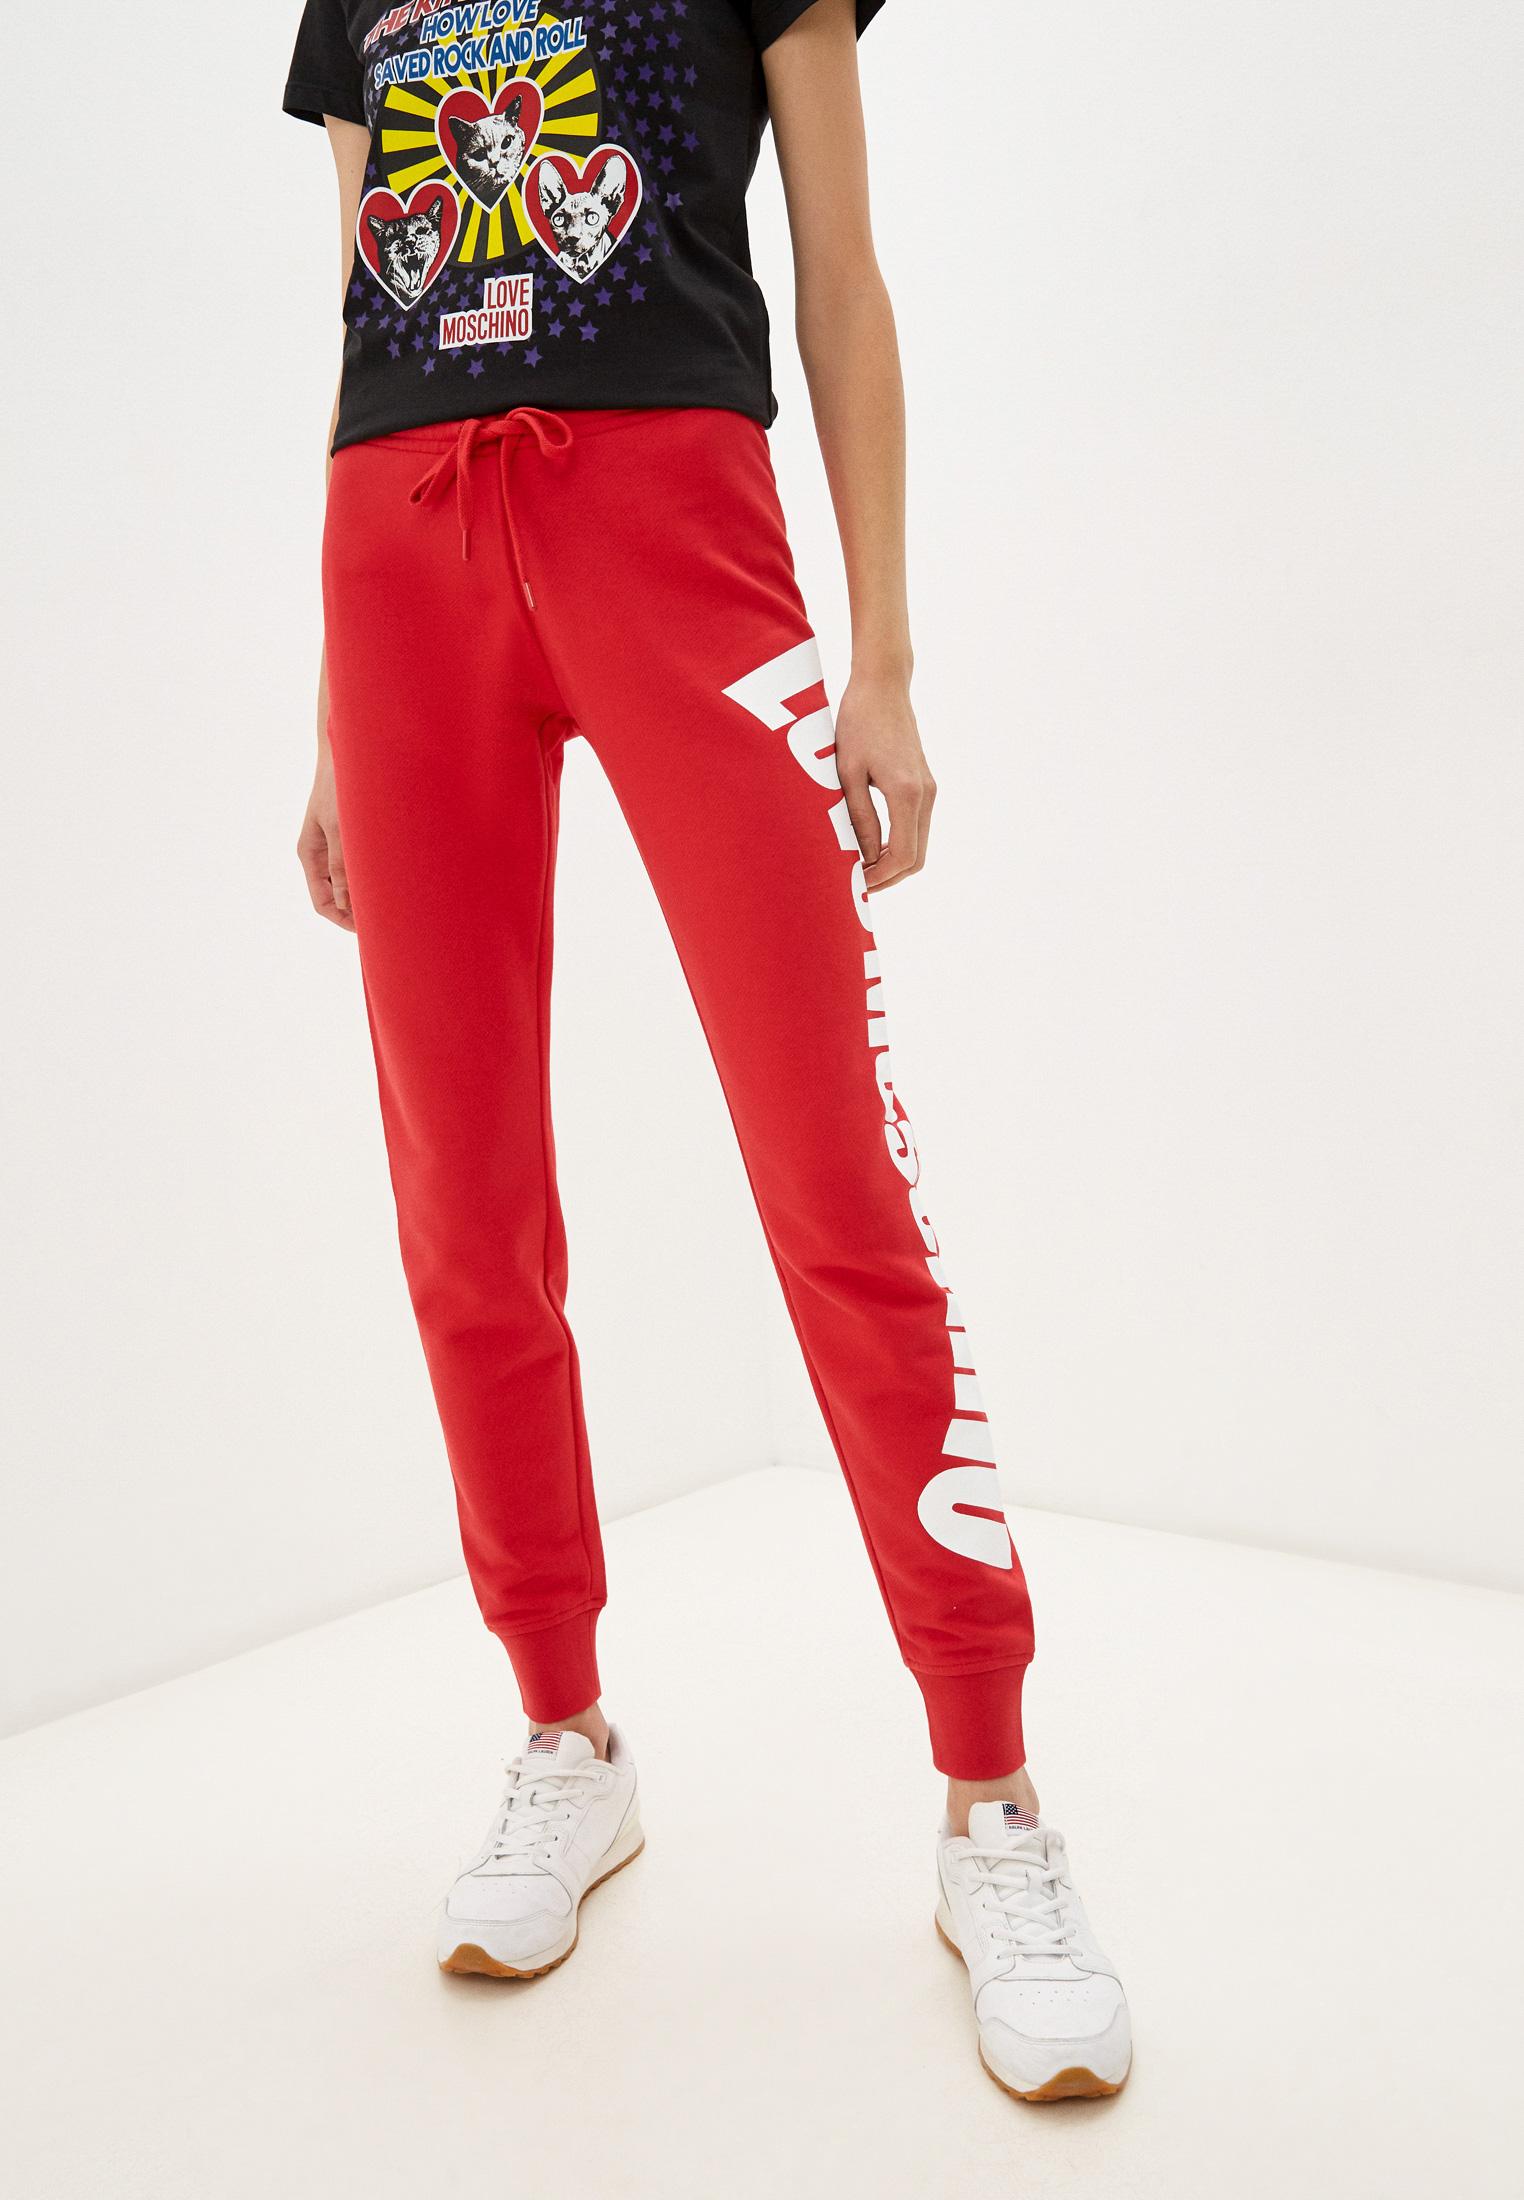 Женские спортивные брюки Love Moschino (Лав Москино) W 1 424 18 M 4055